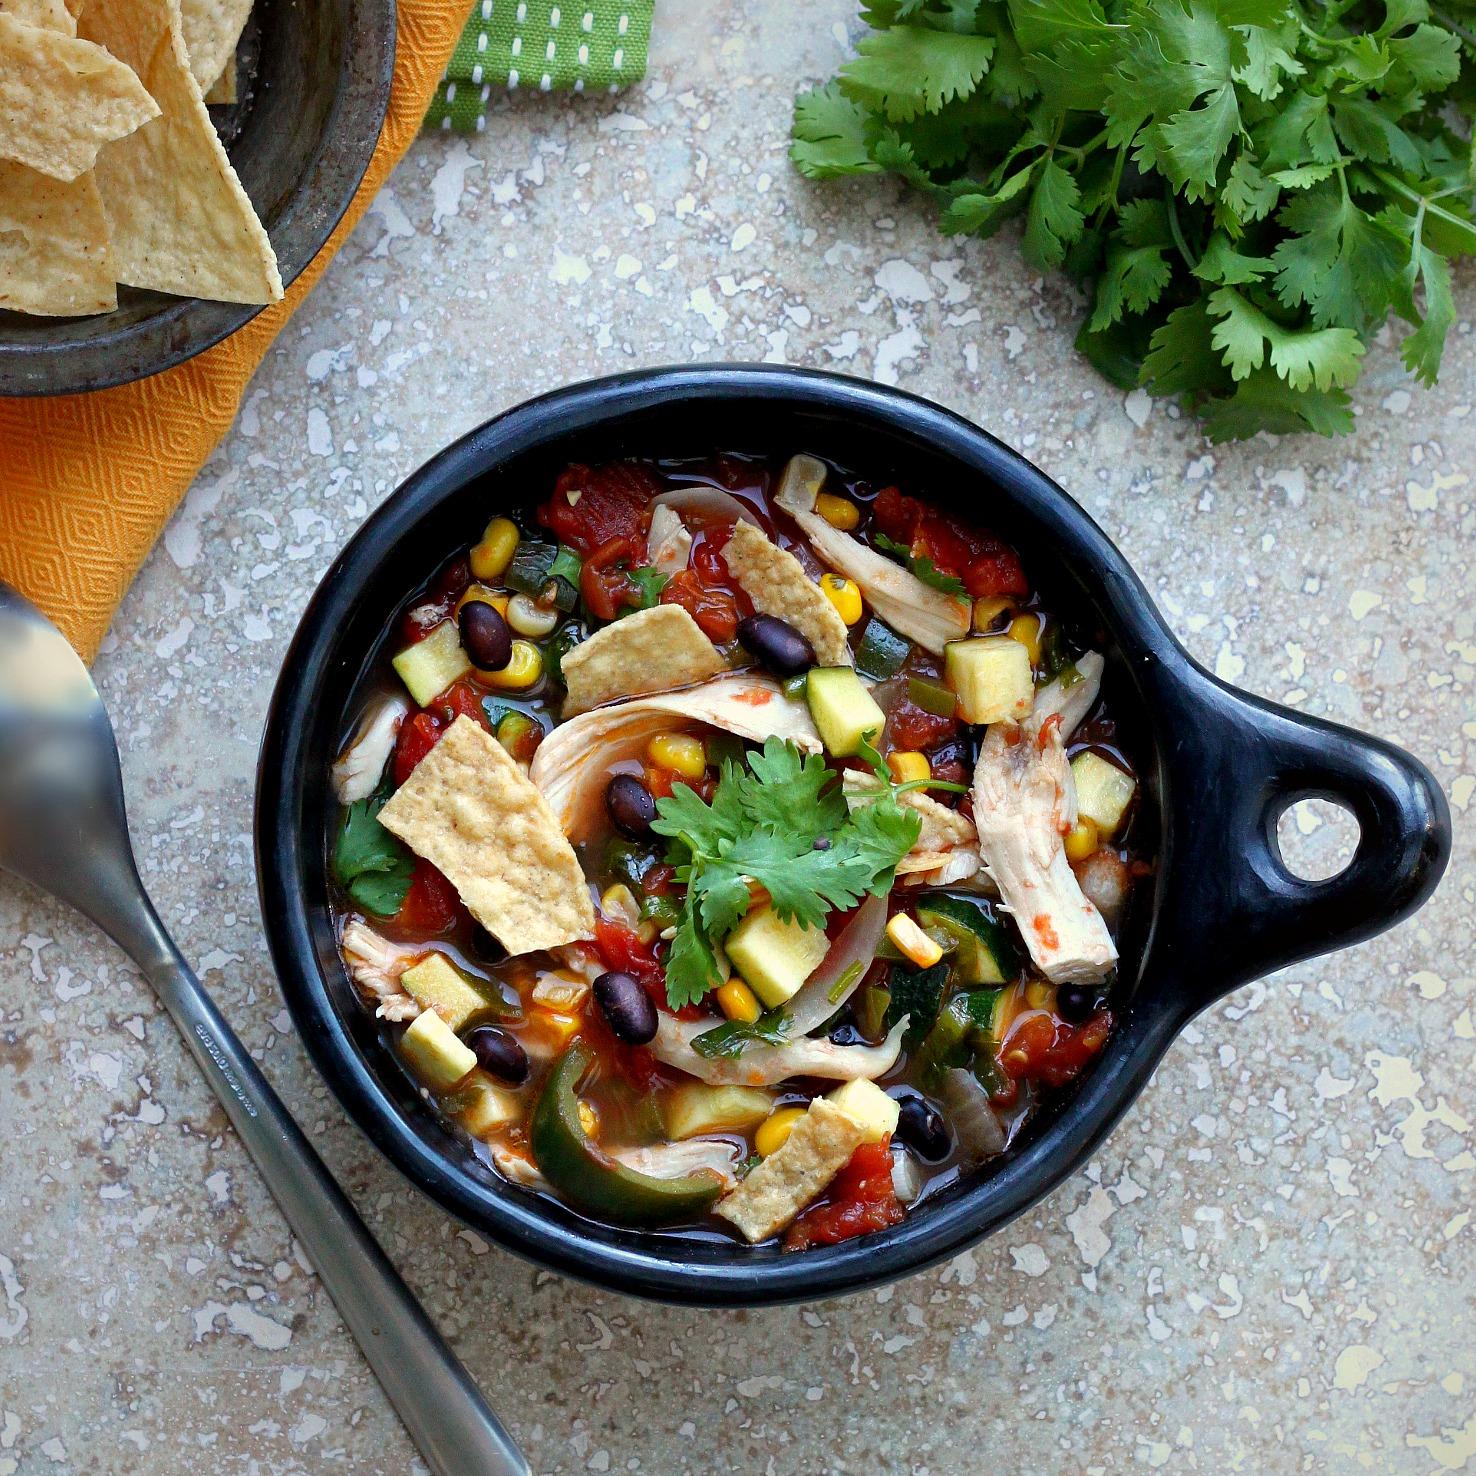 Harvest Soup Kitchen